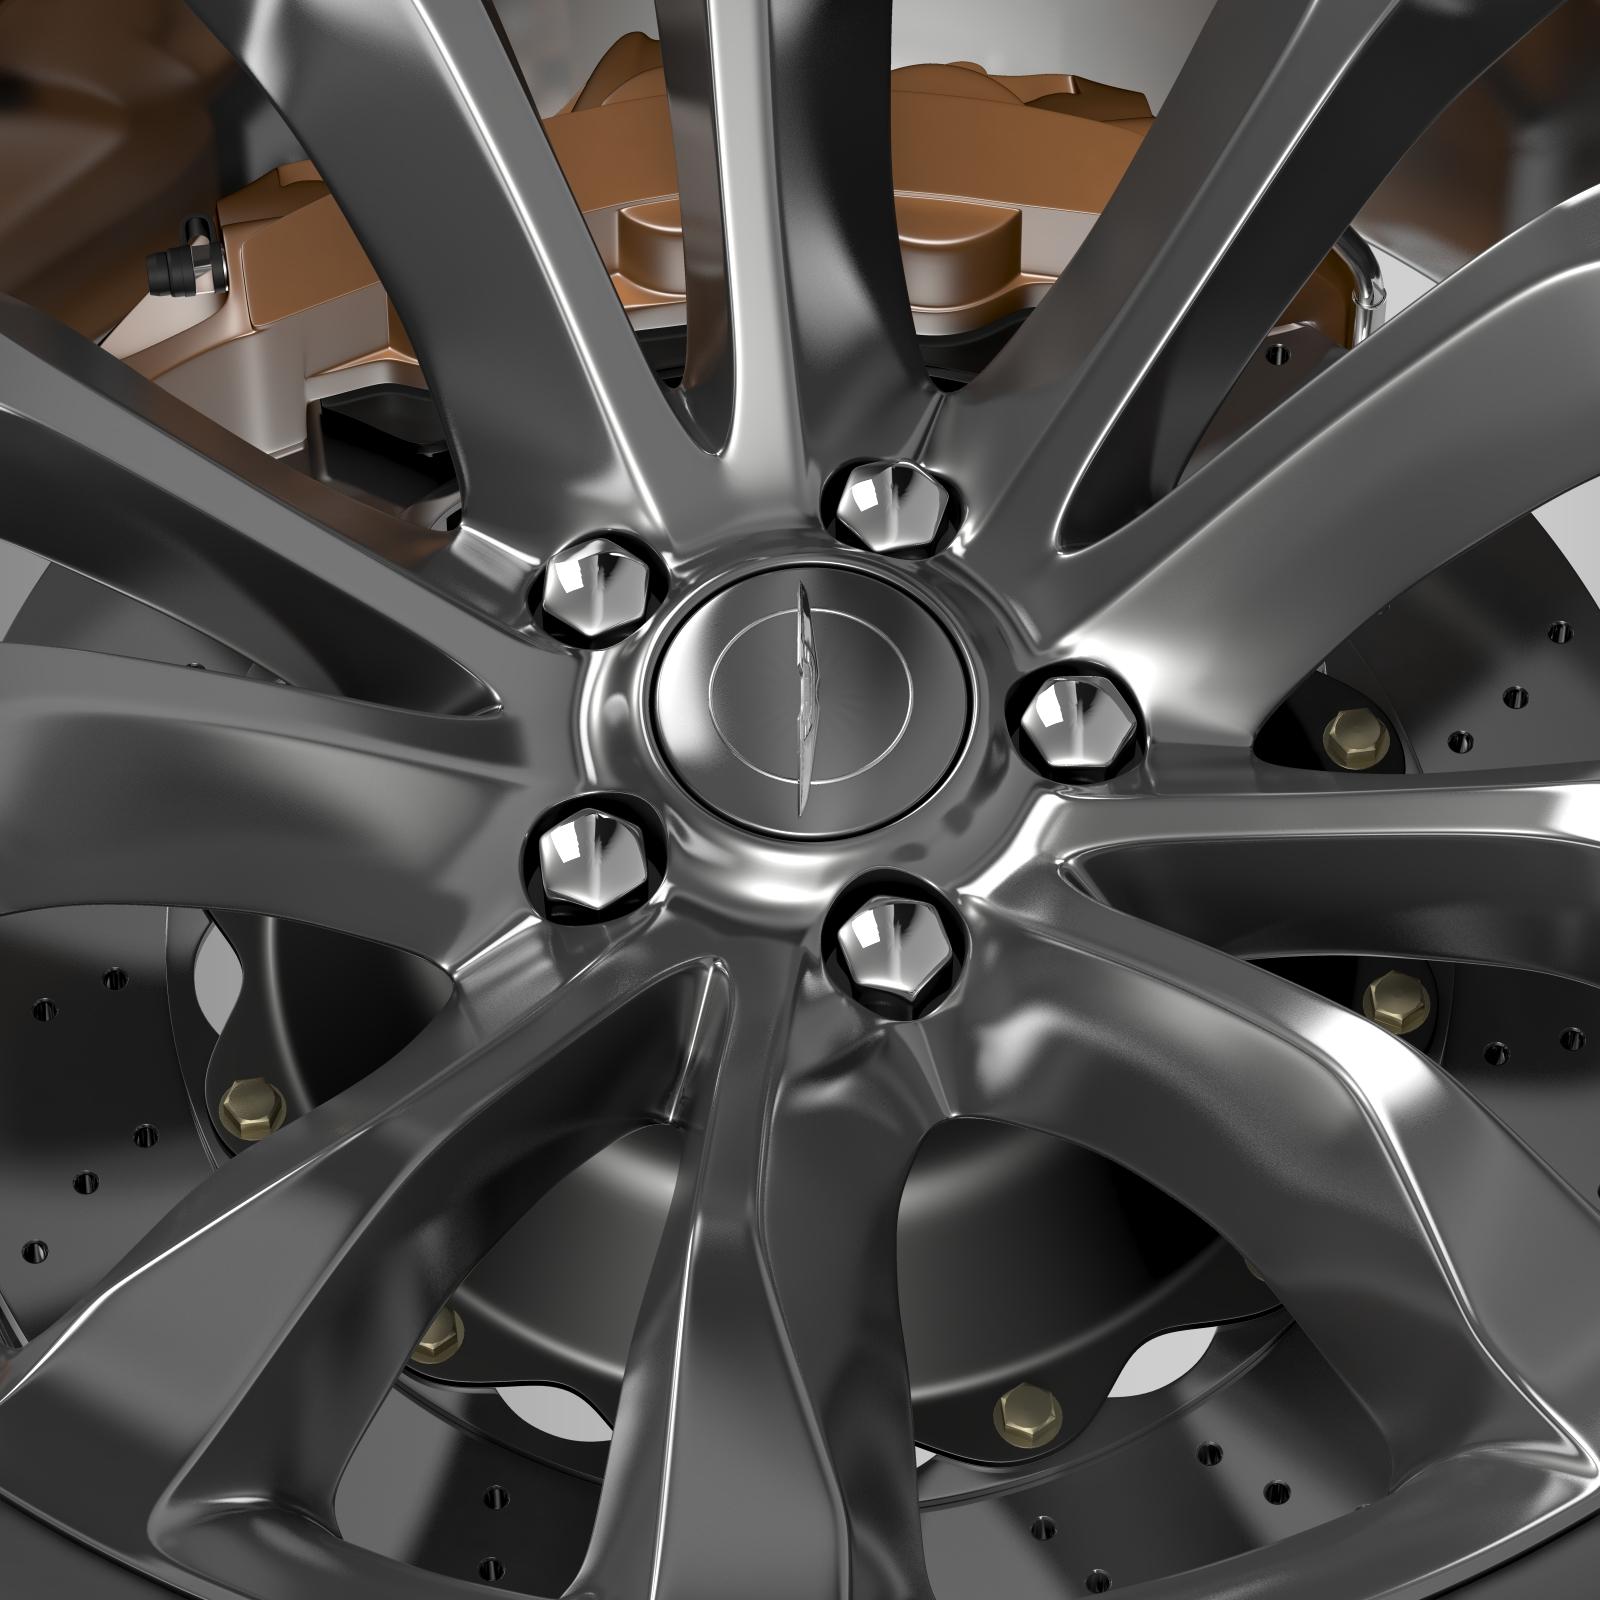 chrysler 300c platinum 2015 wheel 3d model 3ds max fbx c4d lwo ma mb hrc xsi obj 212781